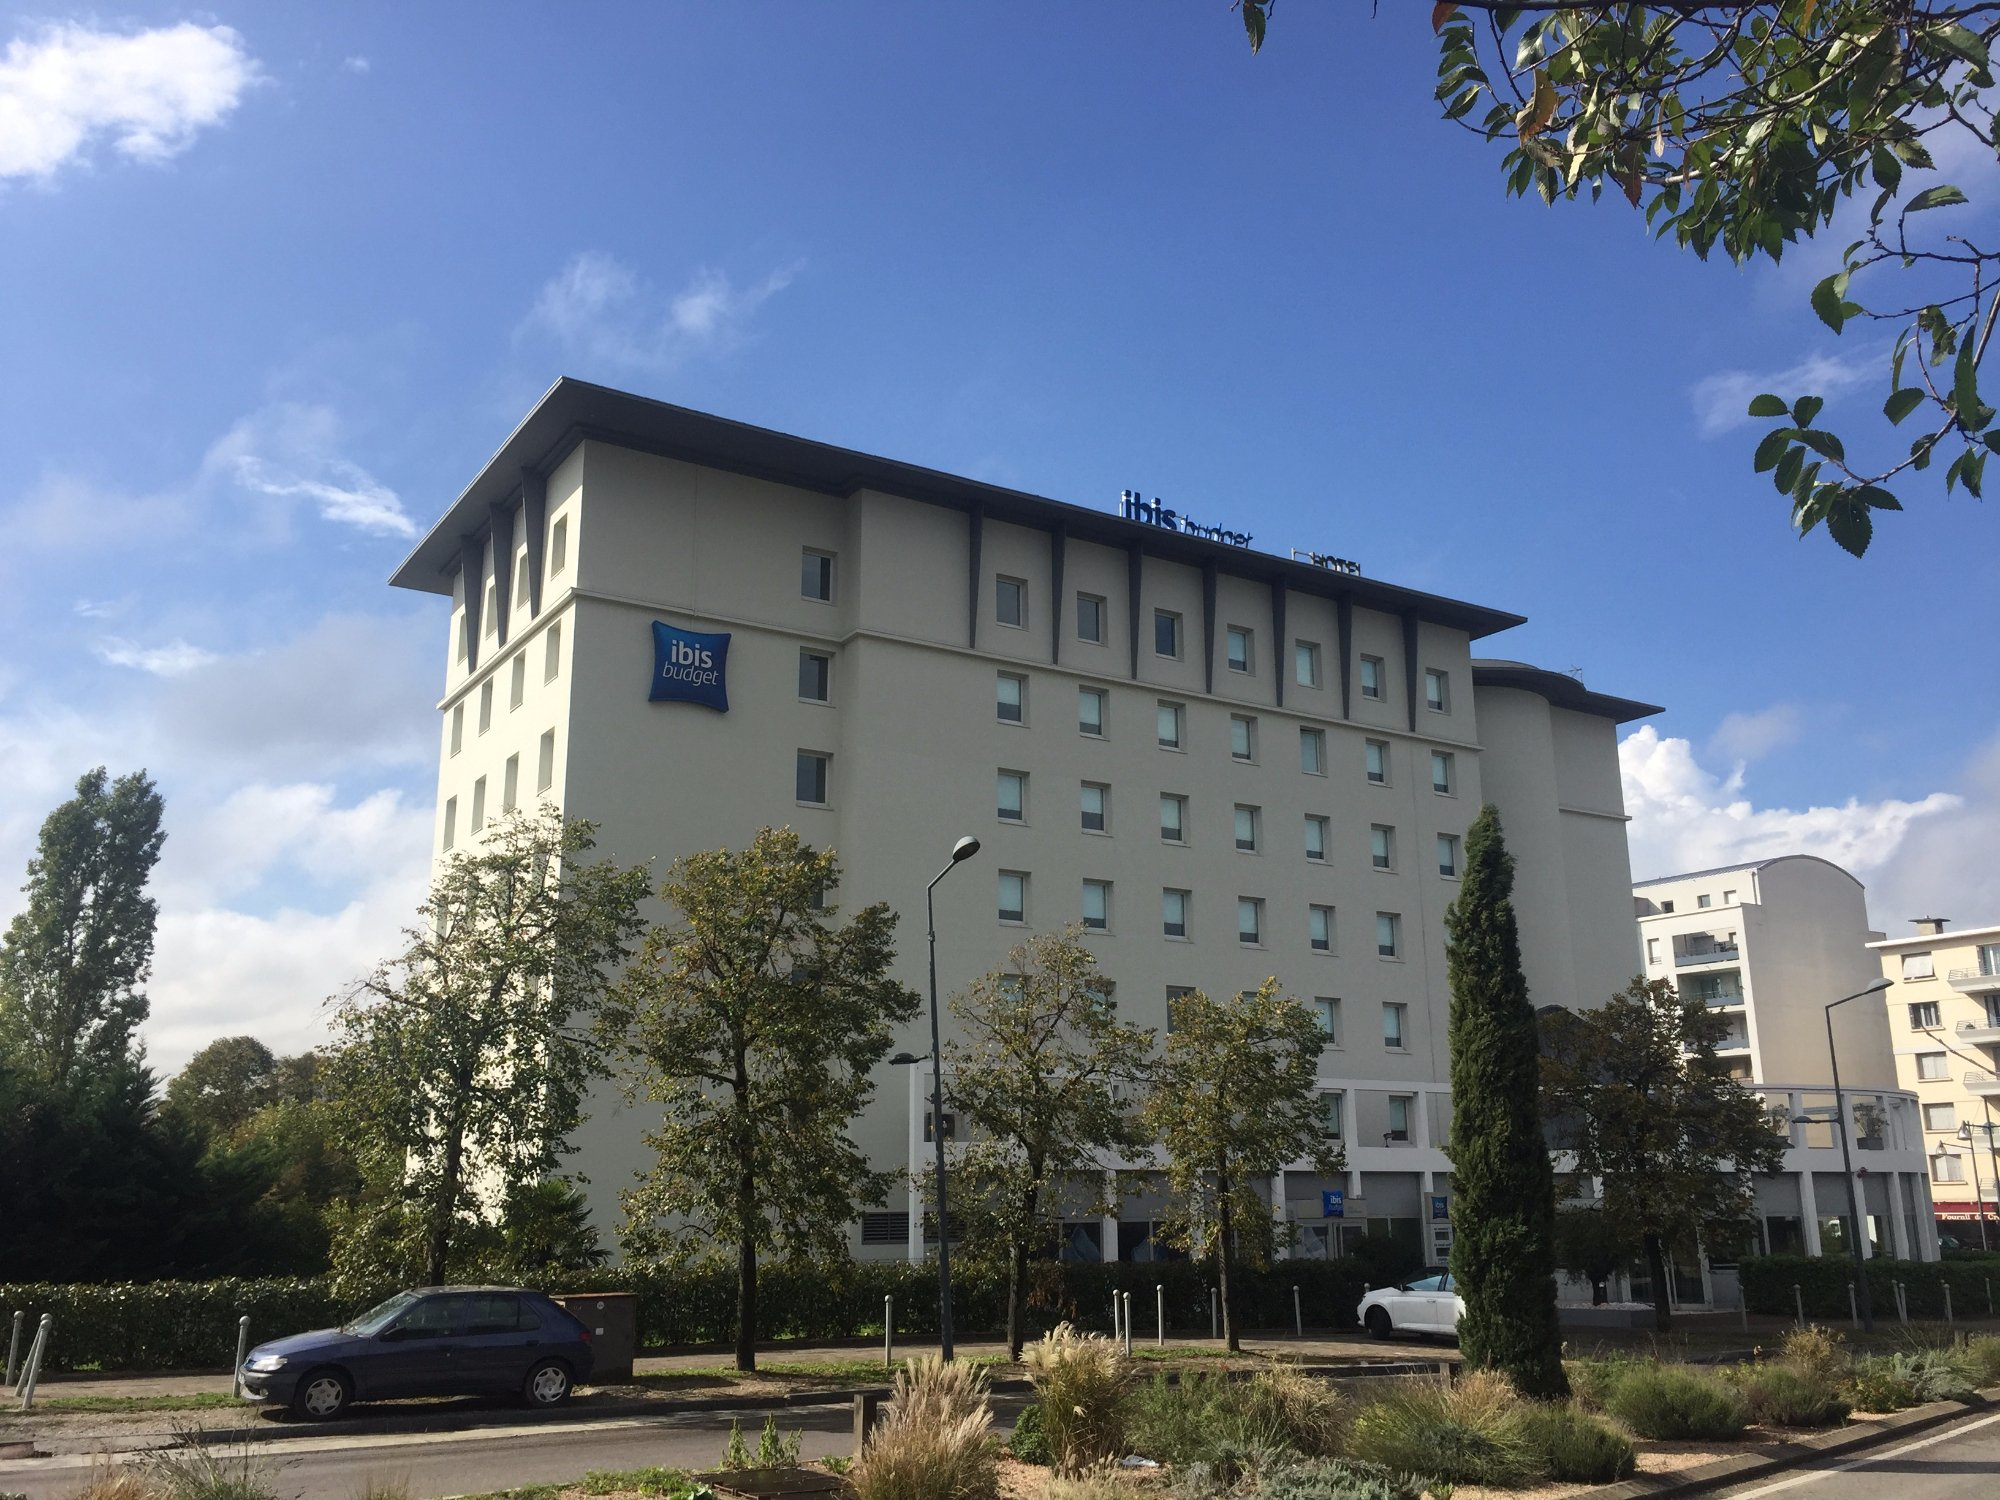 Hotel ibis budget Lyon Villeurbanne